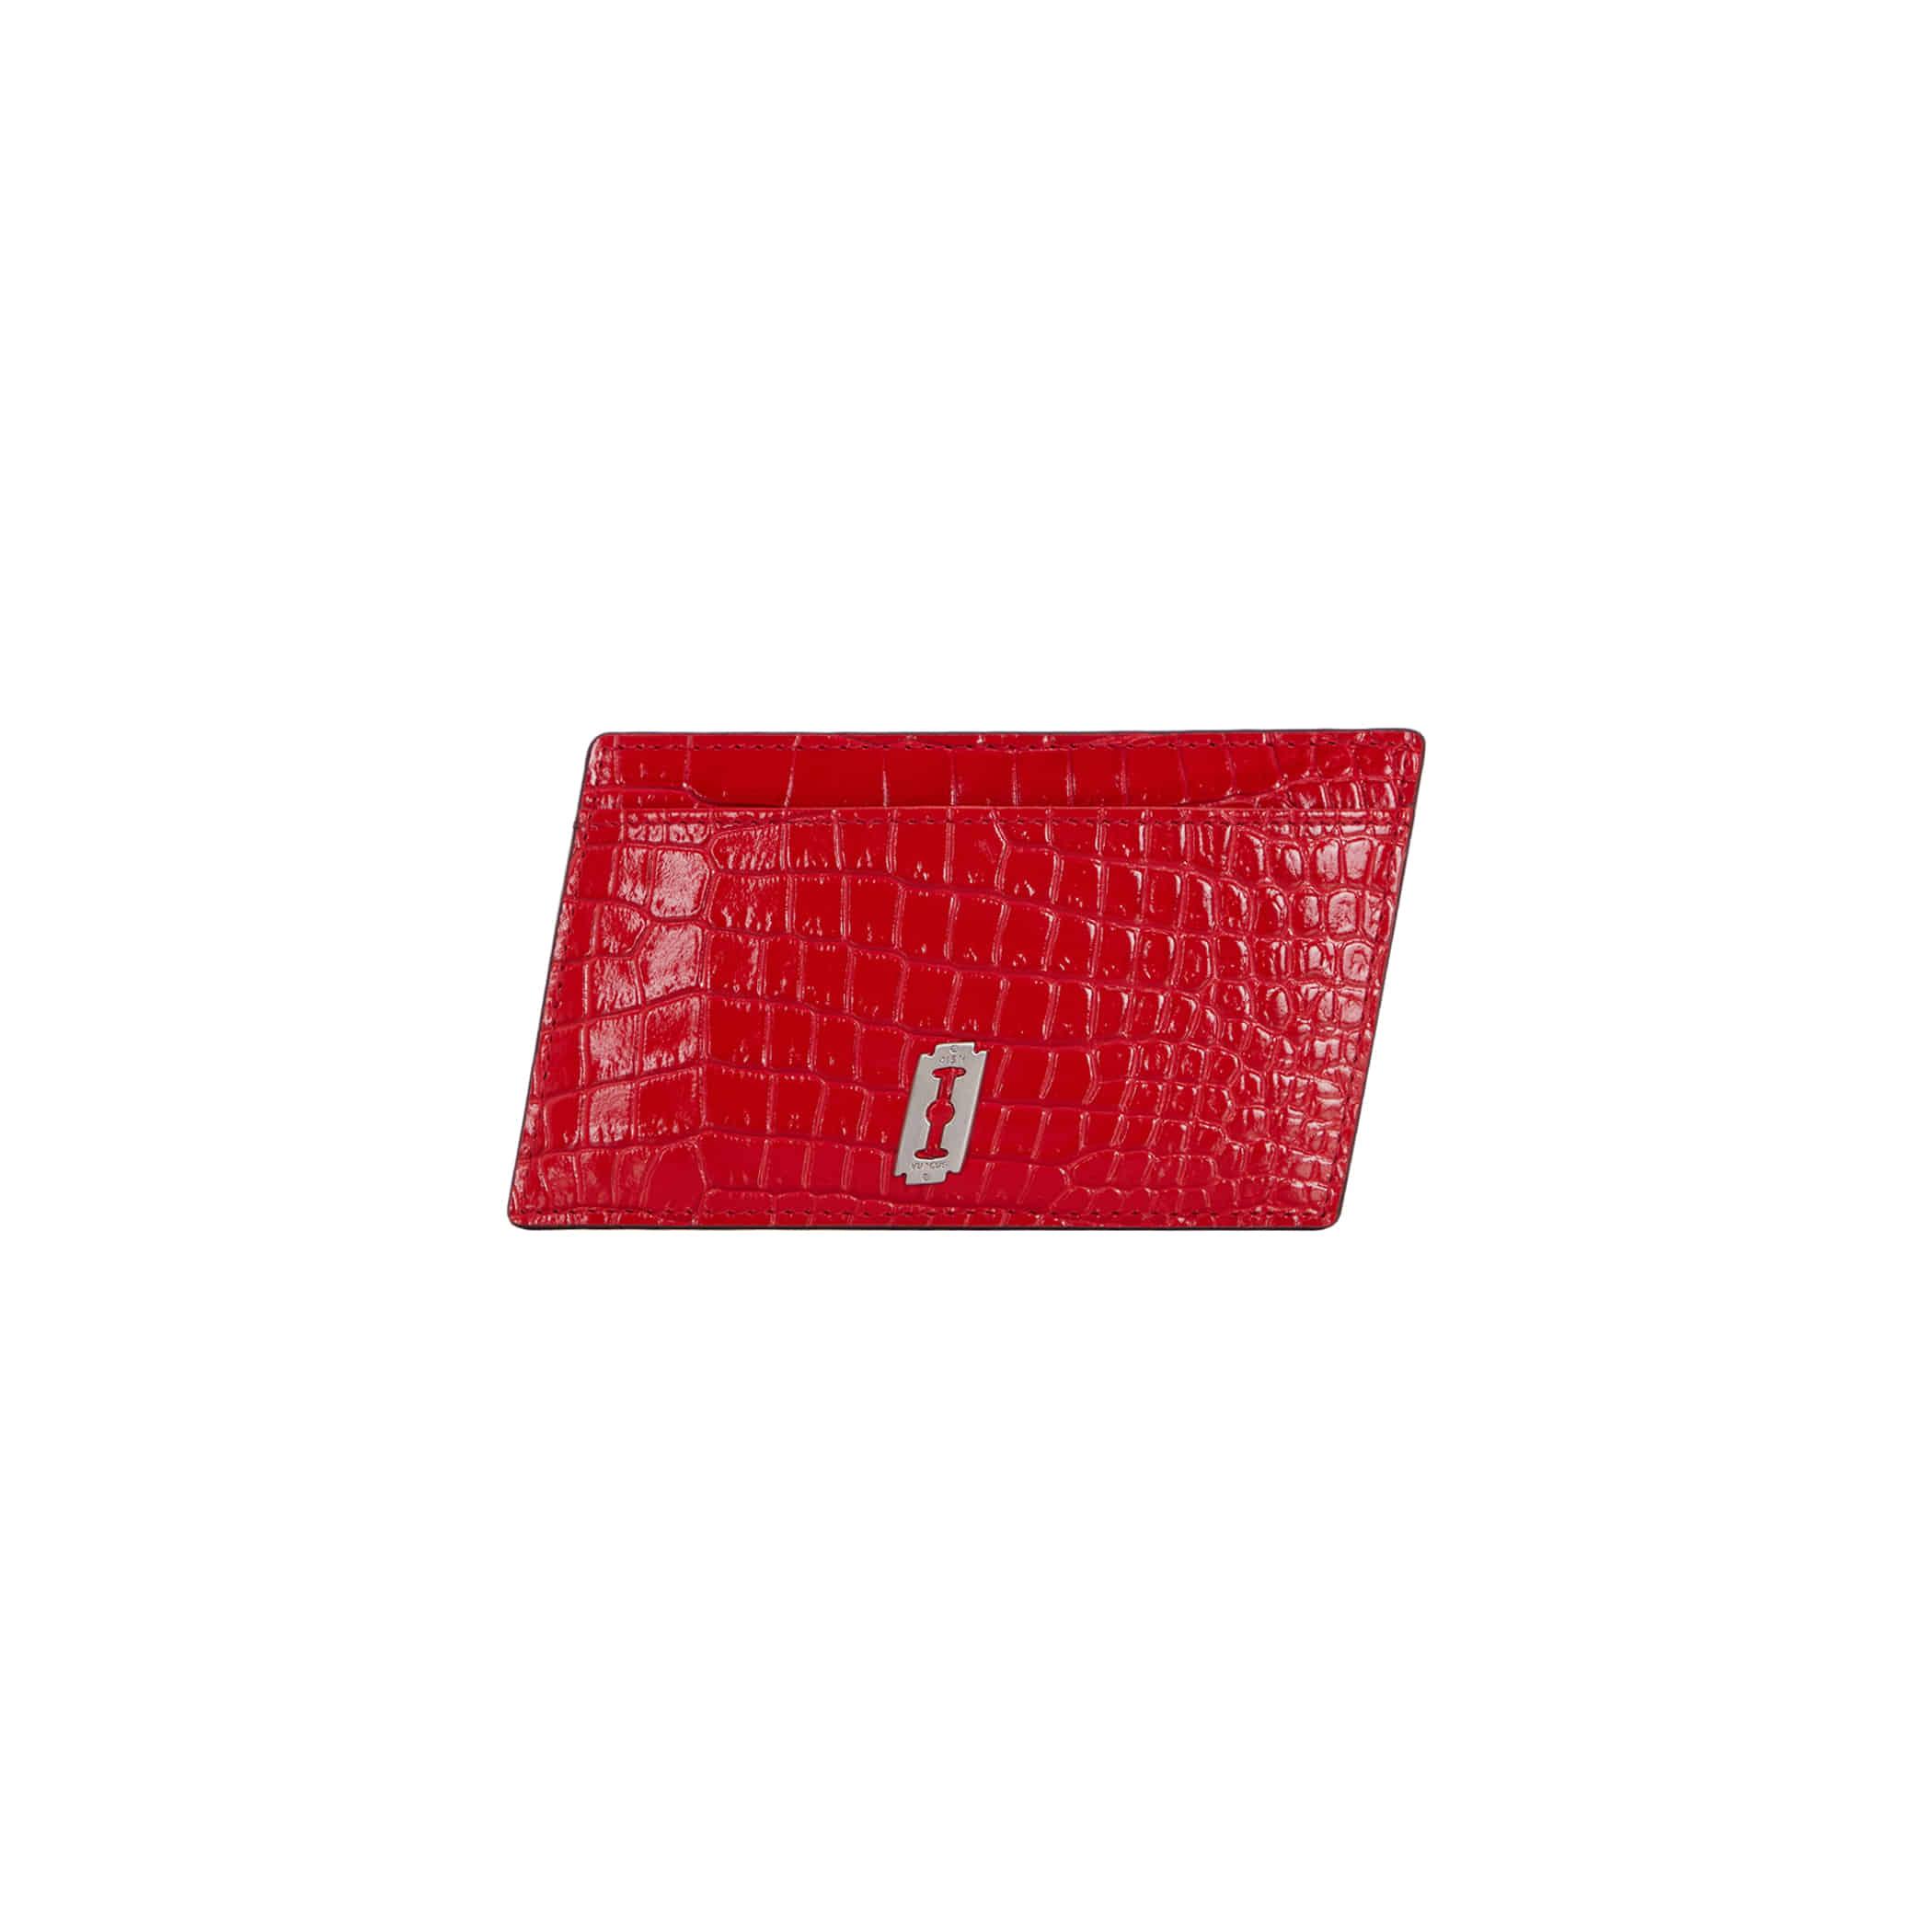 Mercury Square Card Holder (머큐리 스퀘어 카드홀더) Red